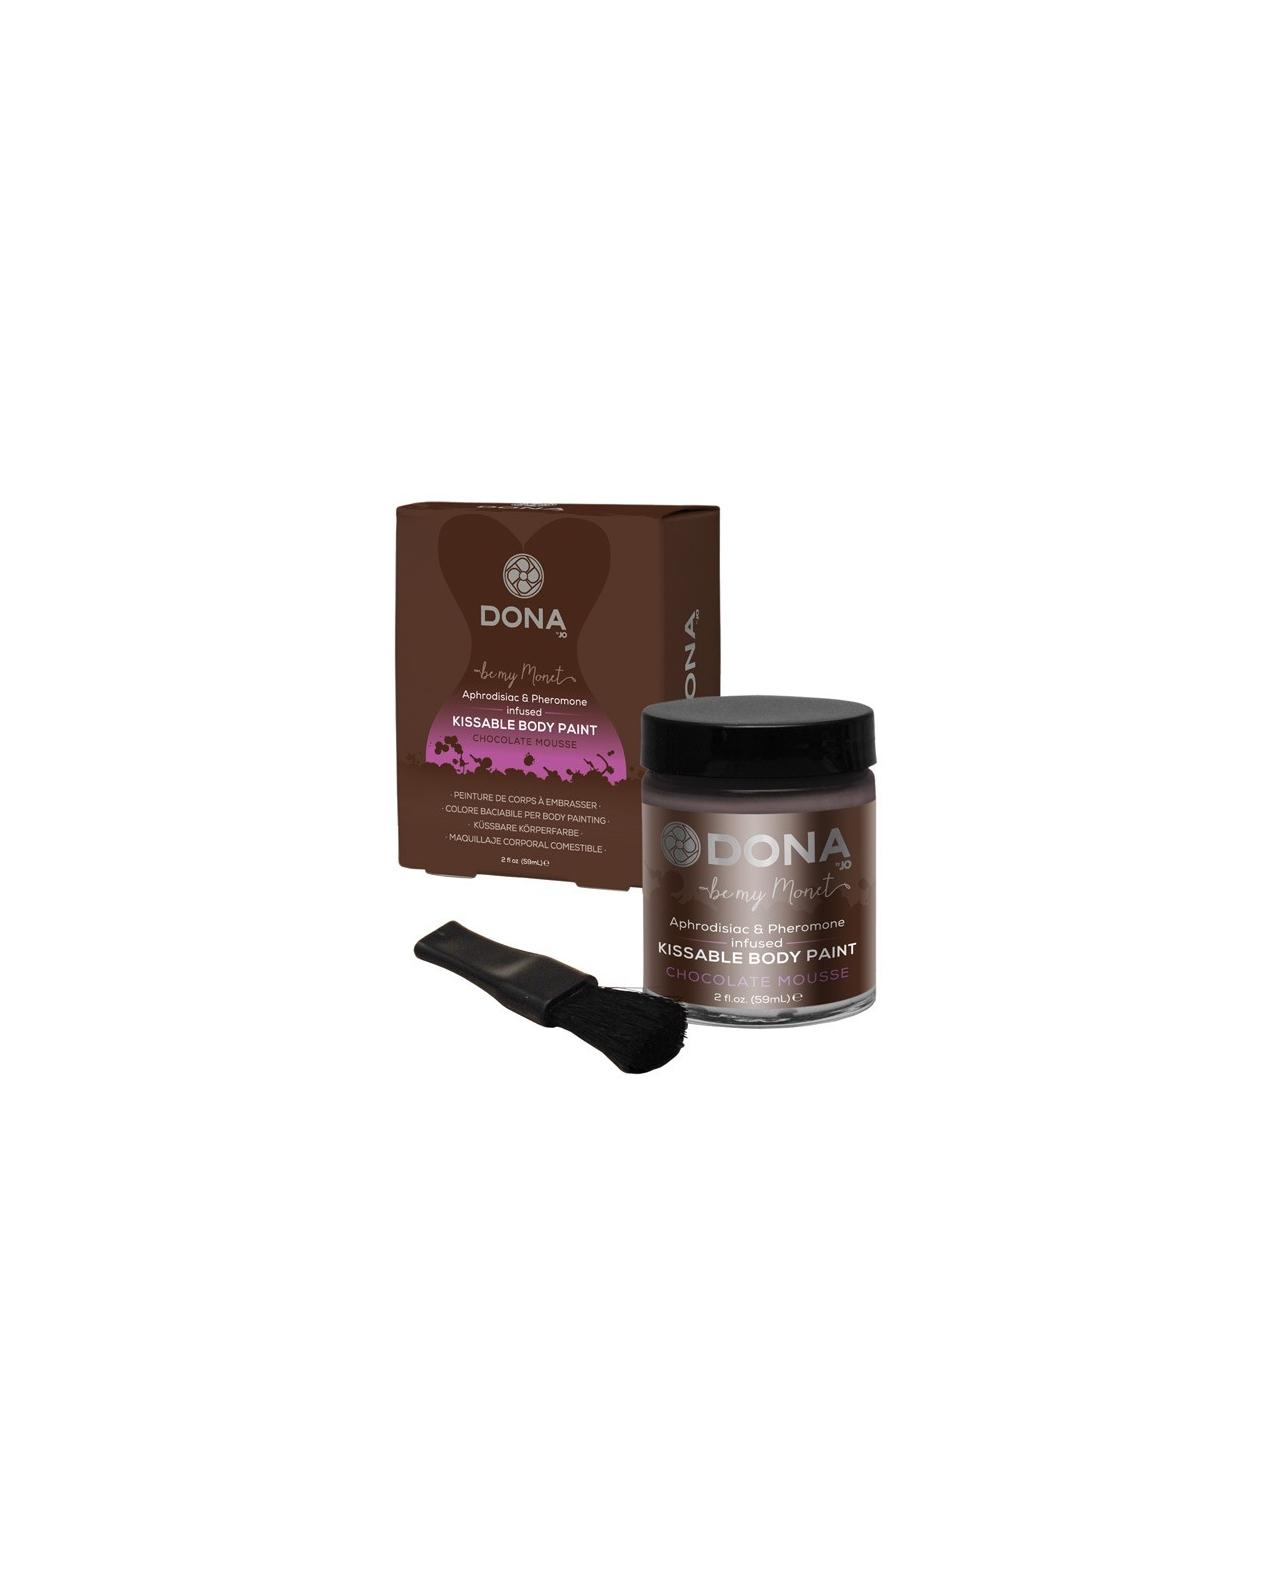 Dona Body Paint - 2 oz Chocolate Mousse